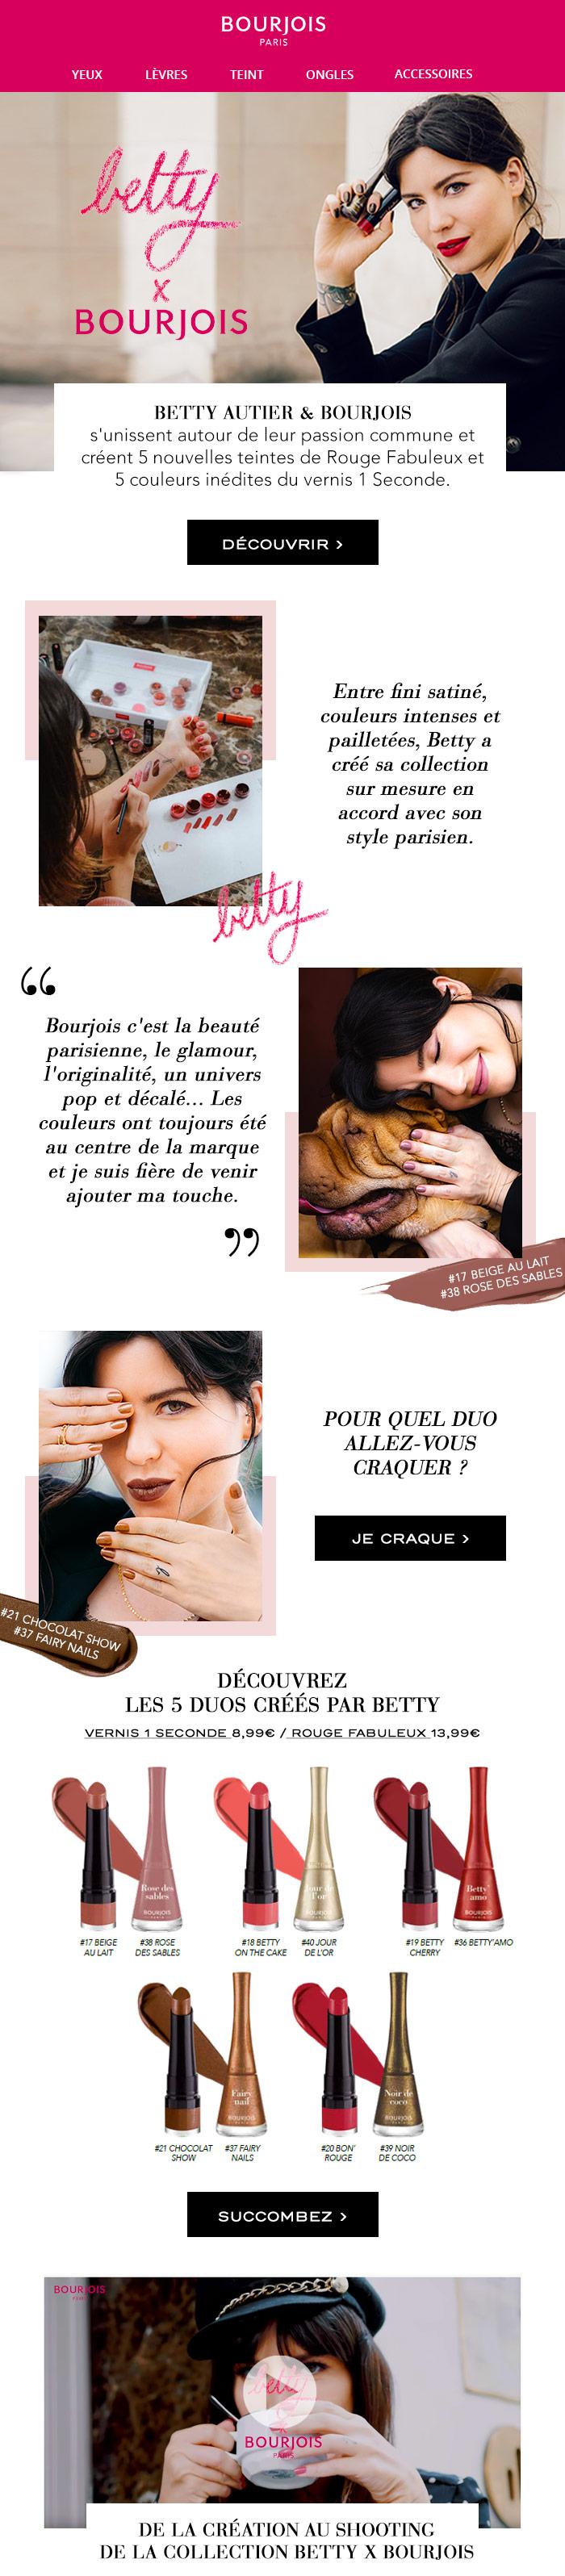 bourjois-newsletter-betty-collection